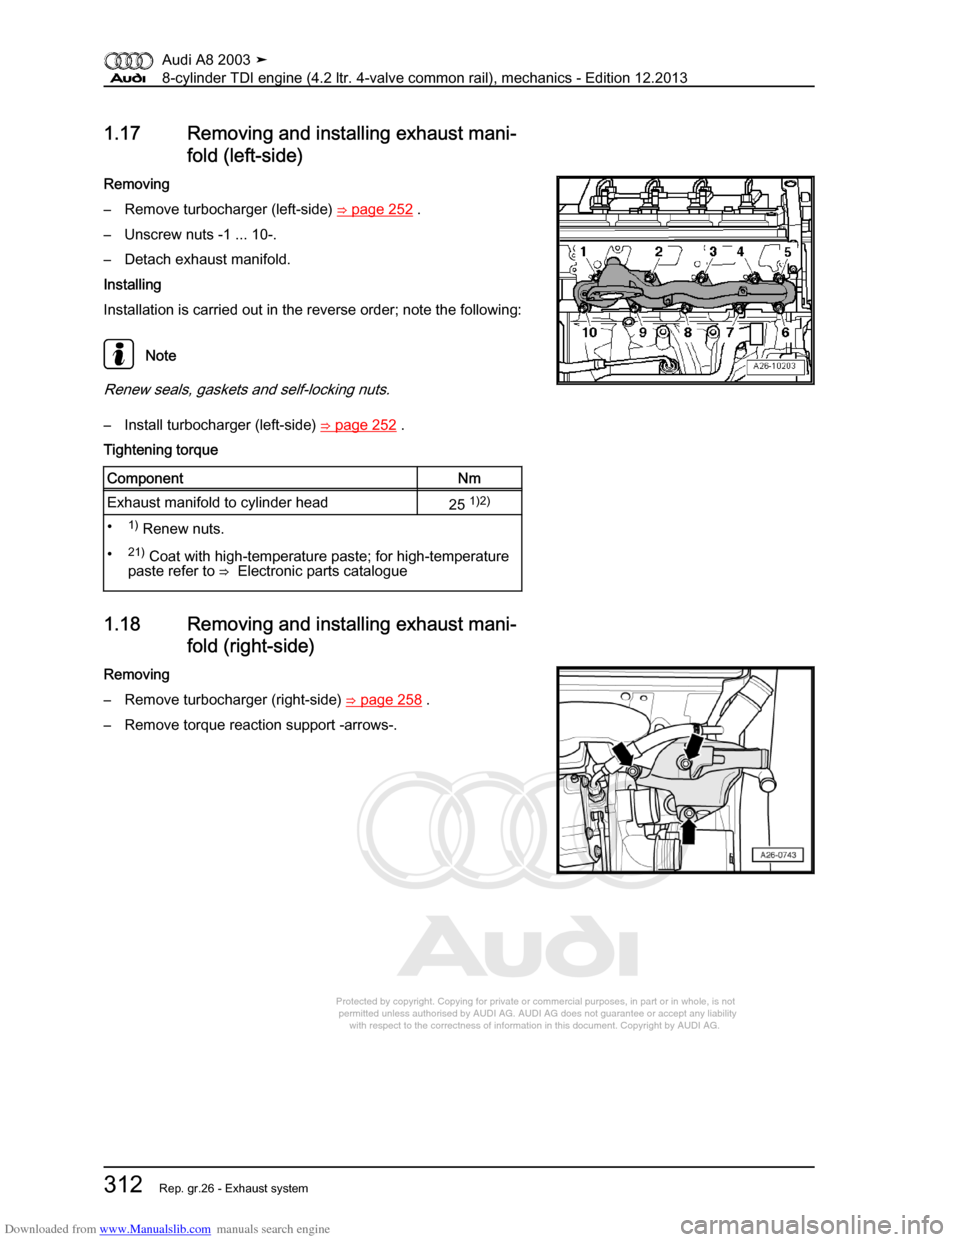 Audi A8 2003 D3 2g Bvn Bmc Engines Workshop Manual Engine Diagram Torque Head